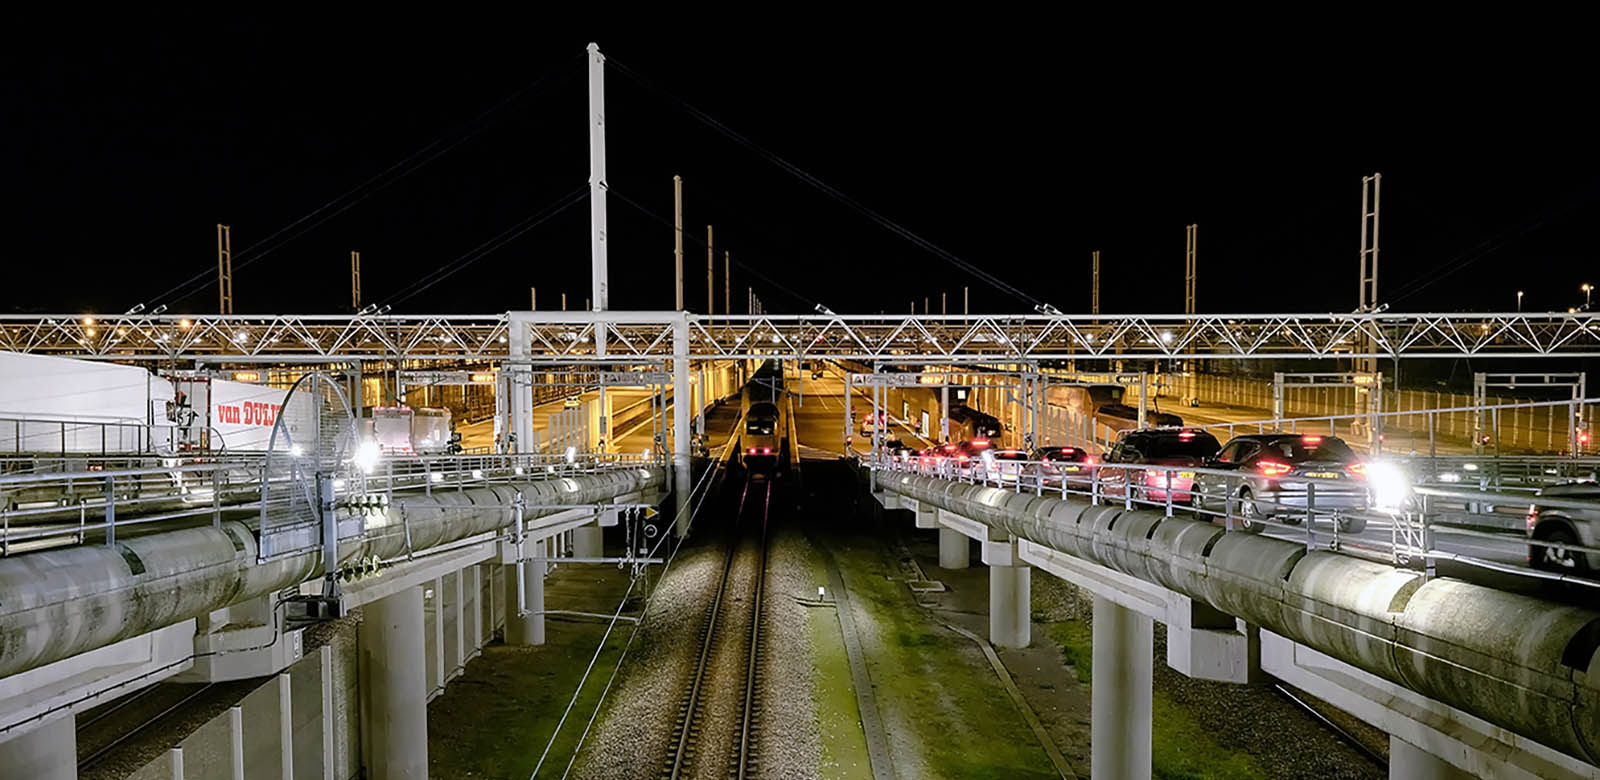 Eurotunnel - Rolling stock